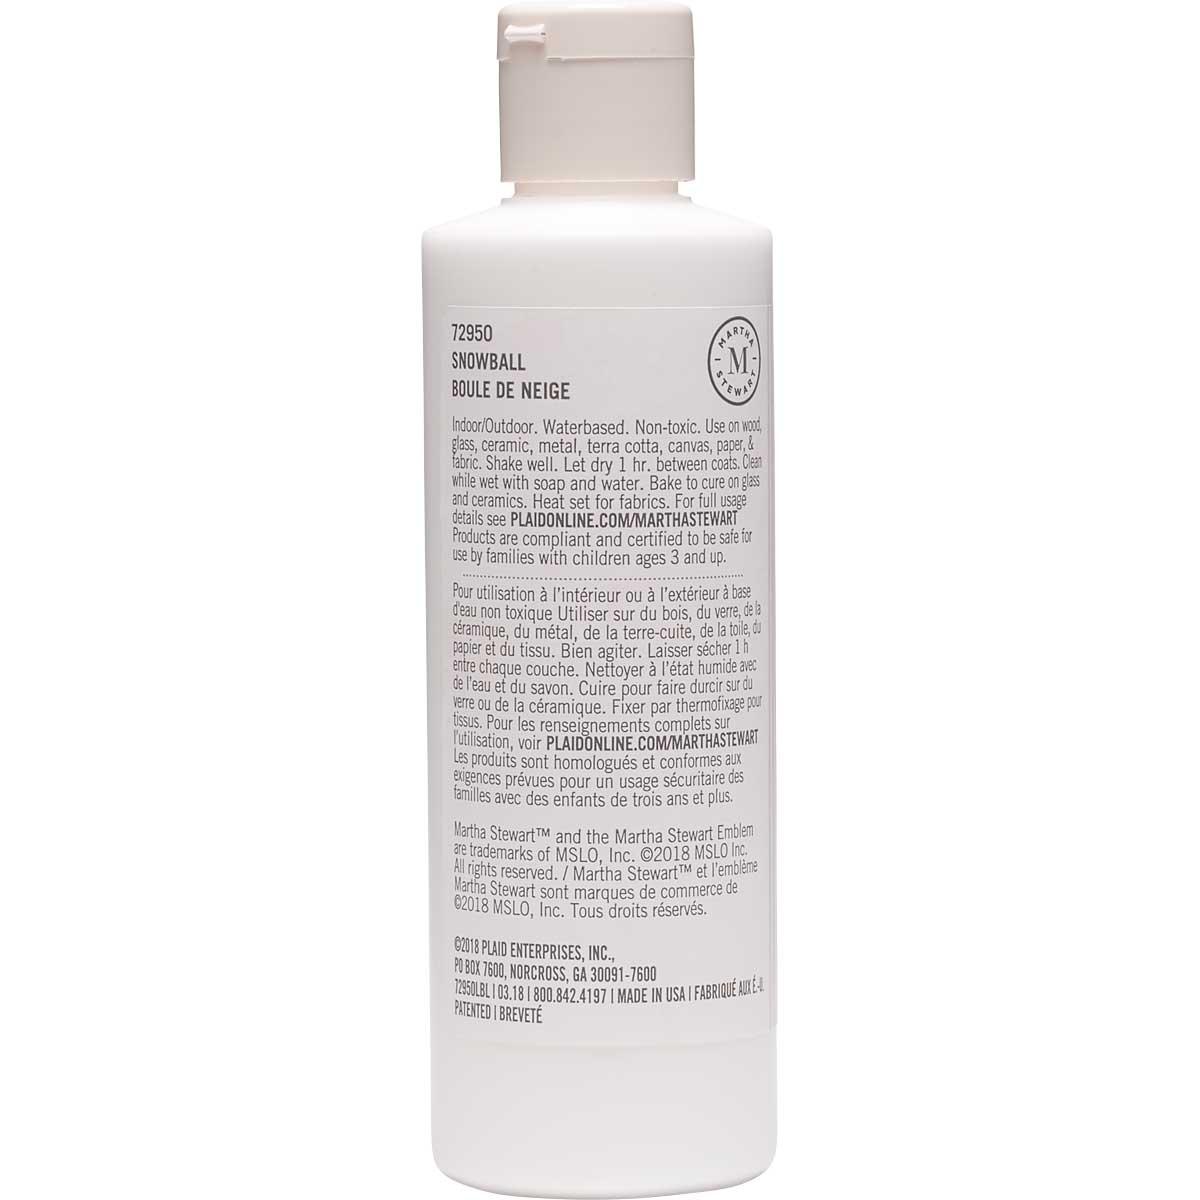 Martha Stewart ® Multi-Surface Satin Acrylic Craft Paint CPSIA - Snowball, 8 oz. - 72950